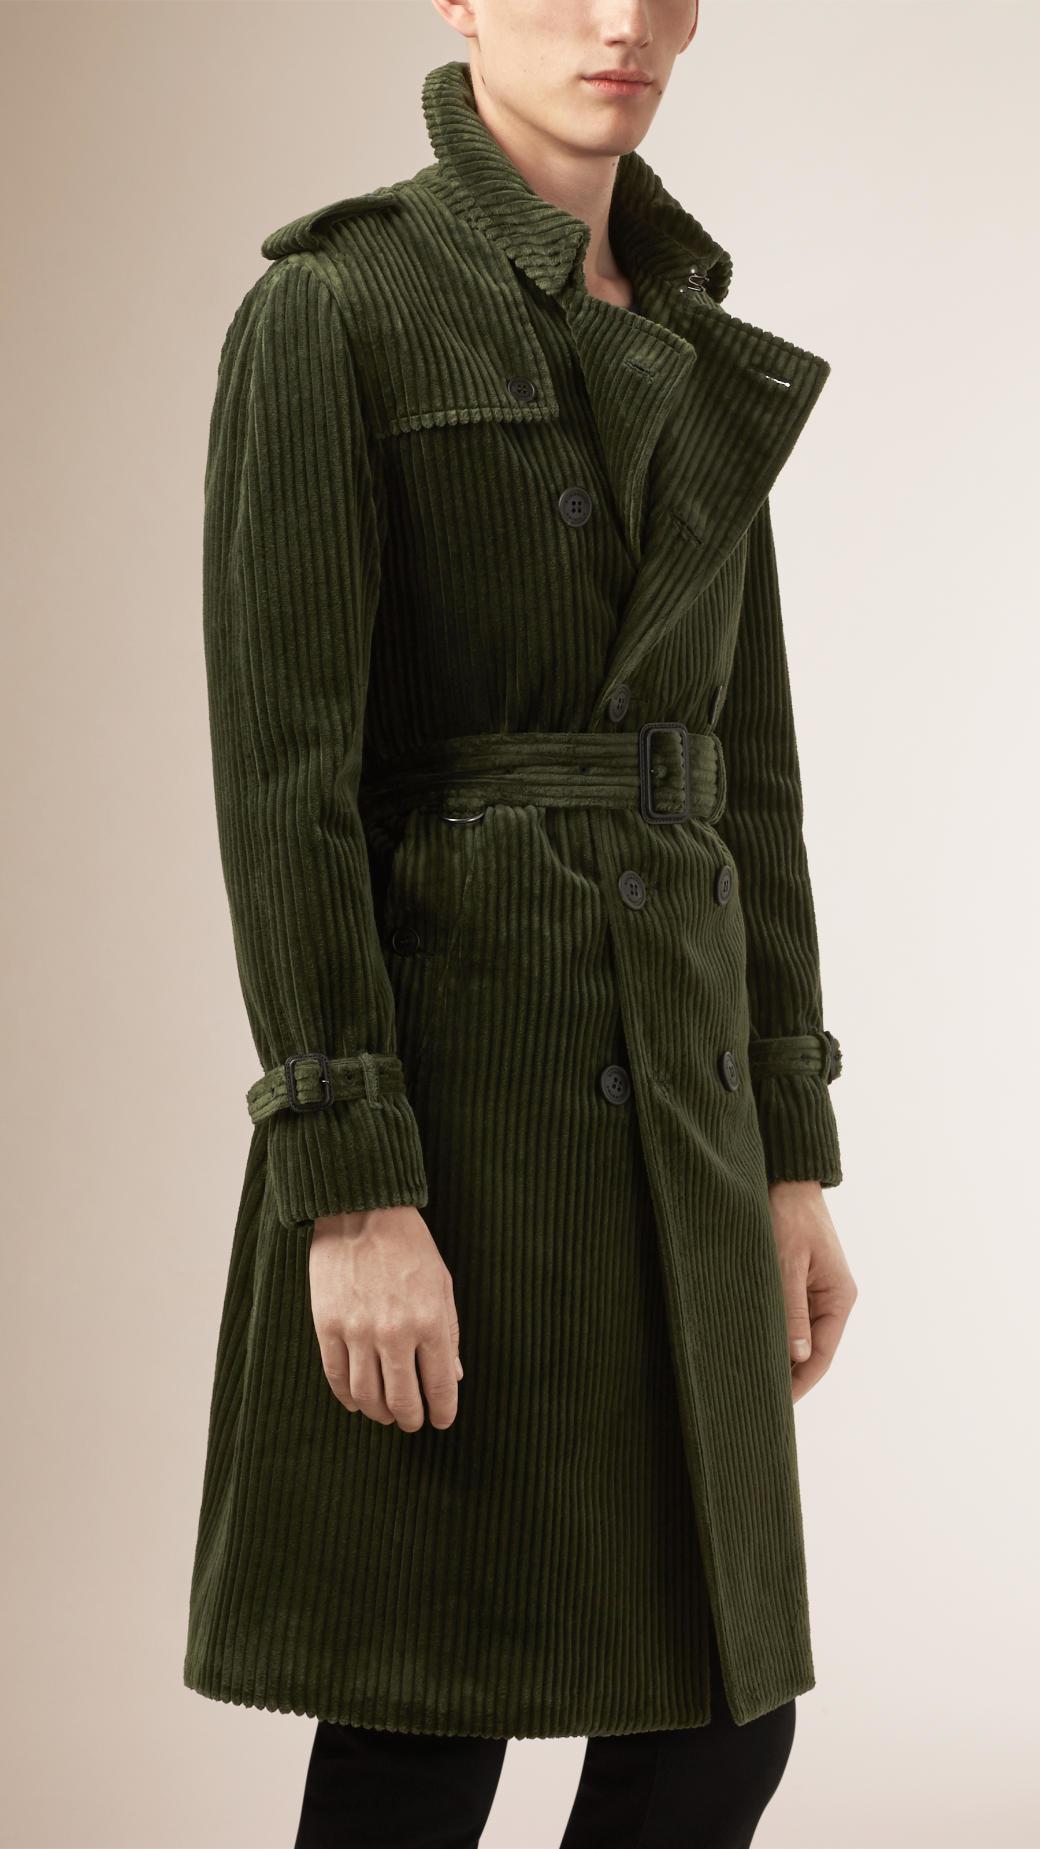 Burberry Corduroy Trench Coat In Green For Men Lyst